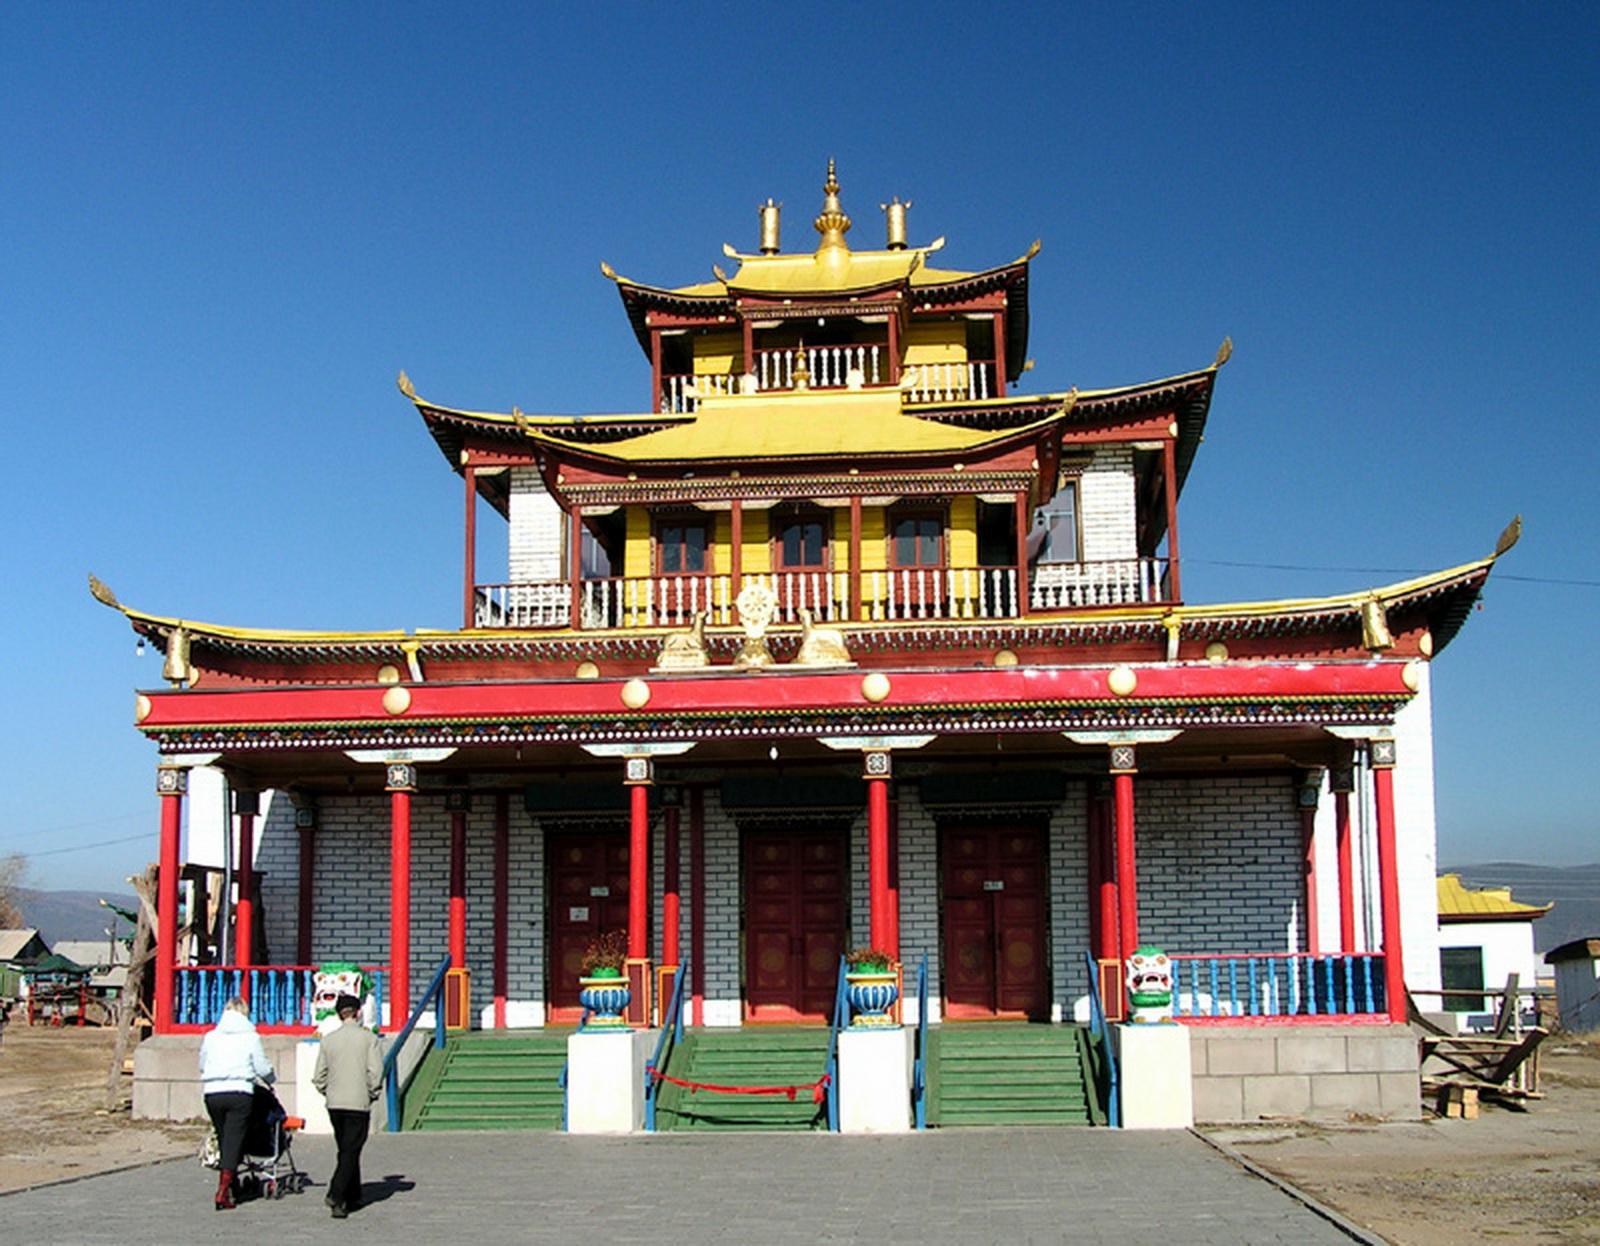 Budistički manastir Datsan u Ulan Udeu